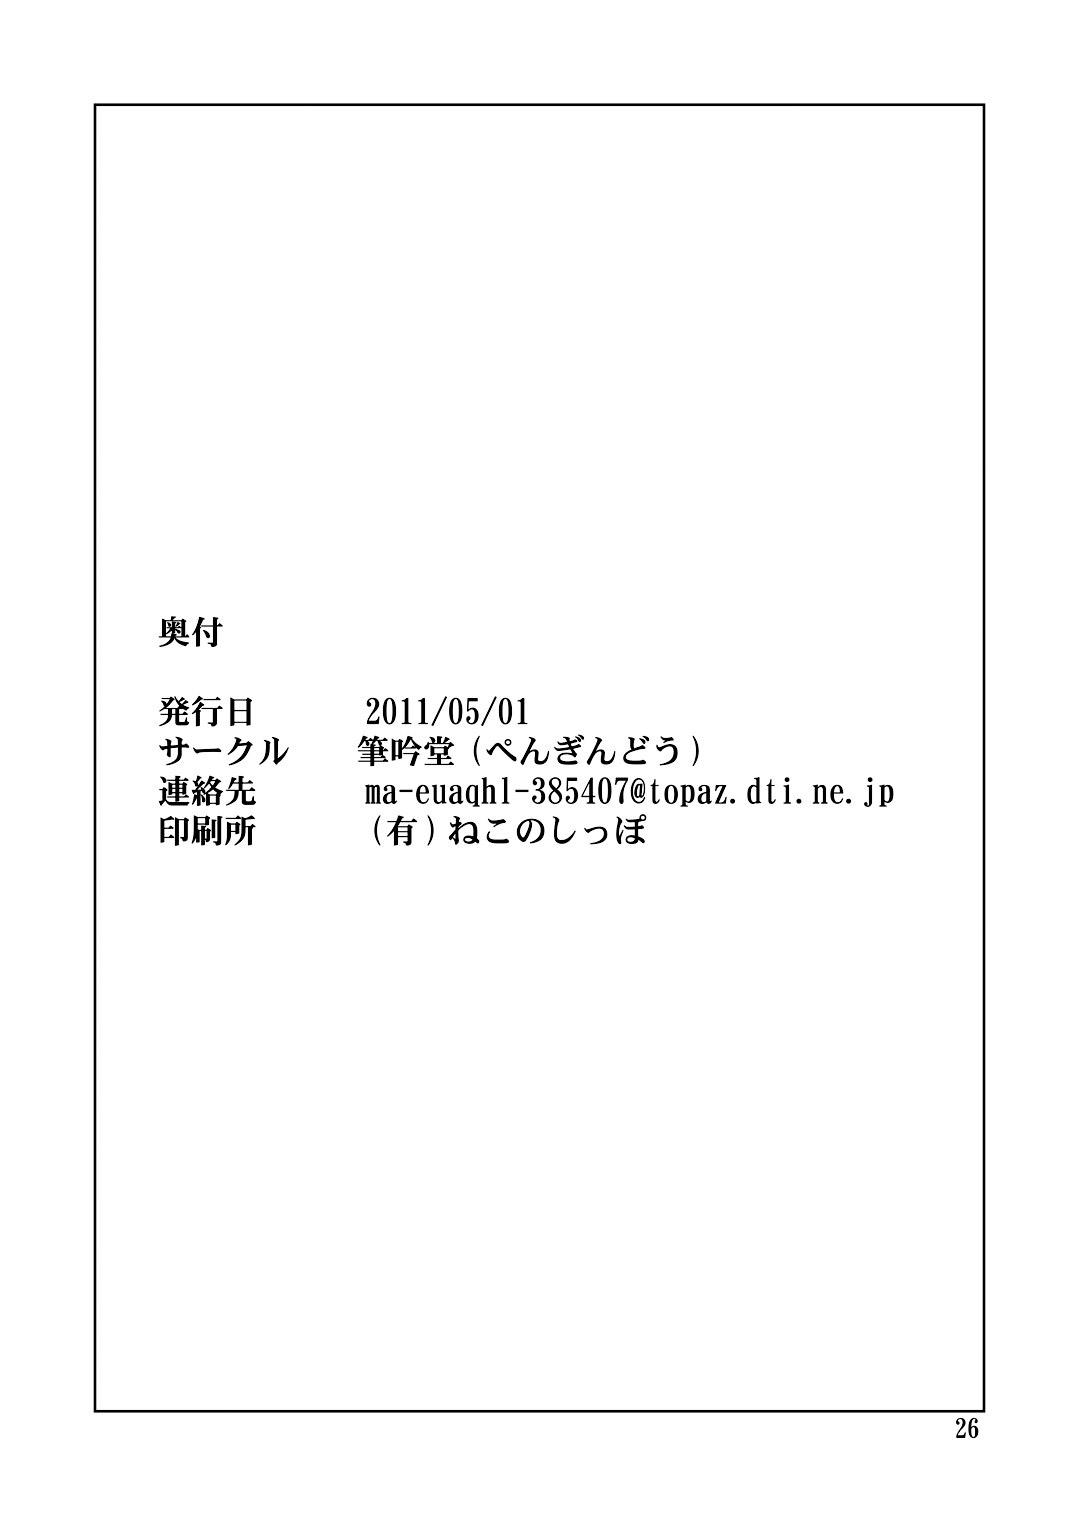 (COMIC1☆05) [Penguindou] Bakunyuu Onna Kyoushi to Deka Chin Seito   Enormous-Breasted Female Teacher and Huge-Dick Student [English] 24